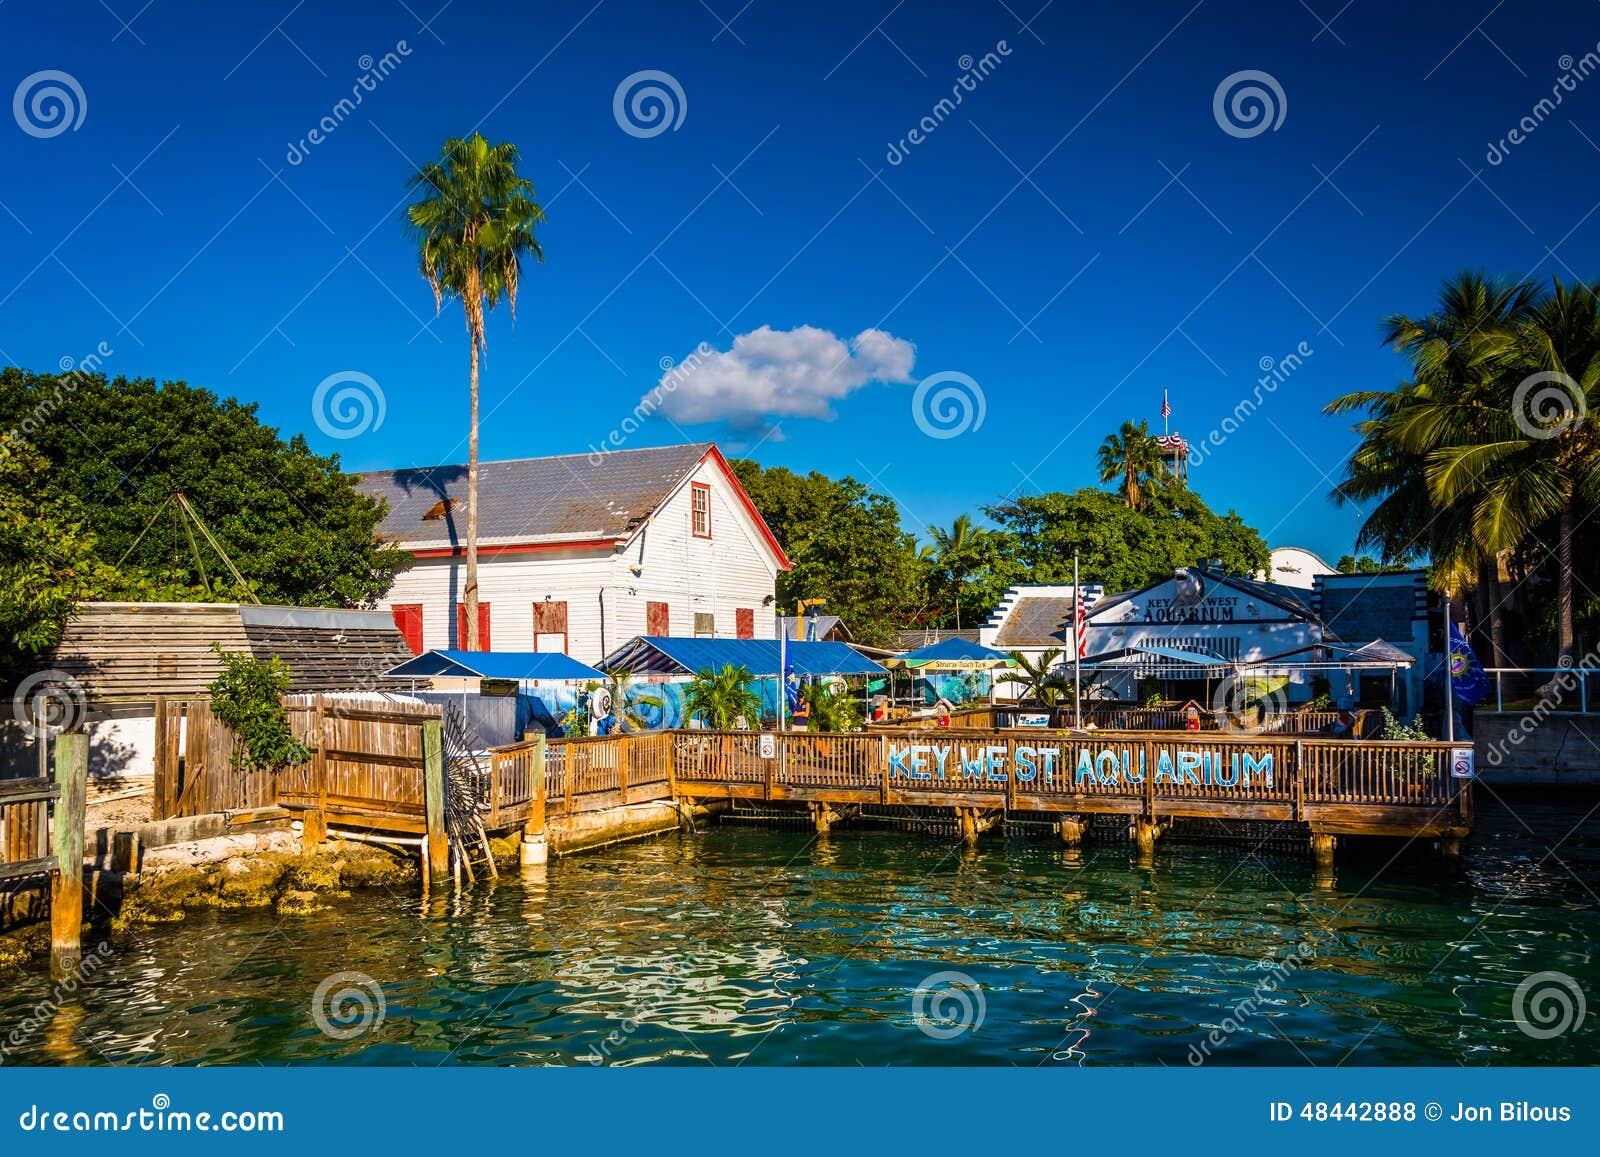 The Key West Aquarium In Key West Florida Editorial Stock Photo Image 48442888